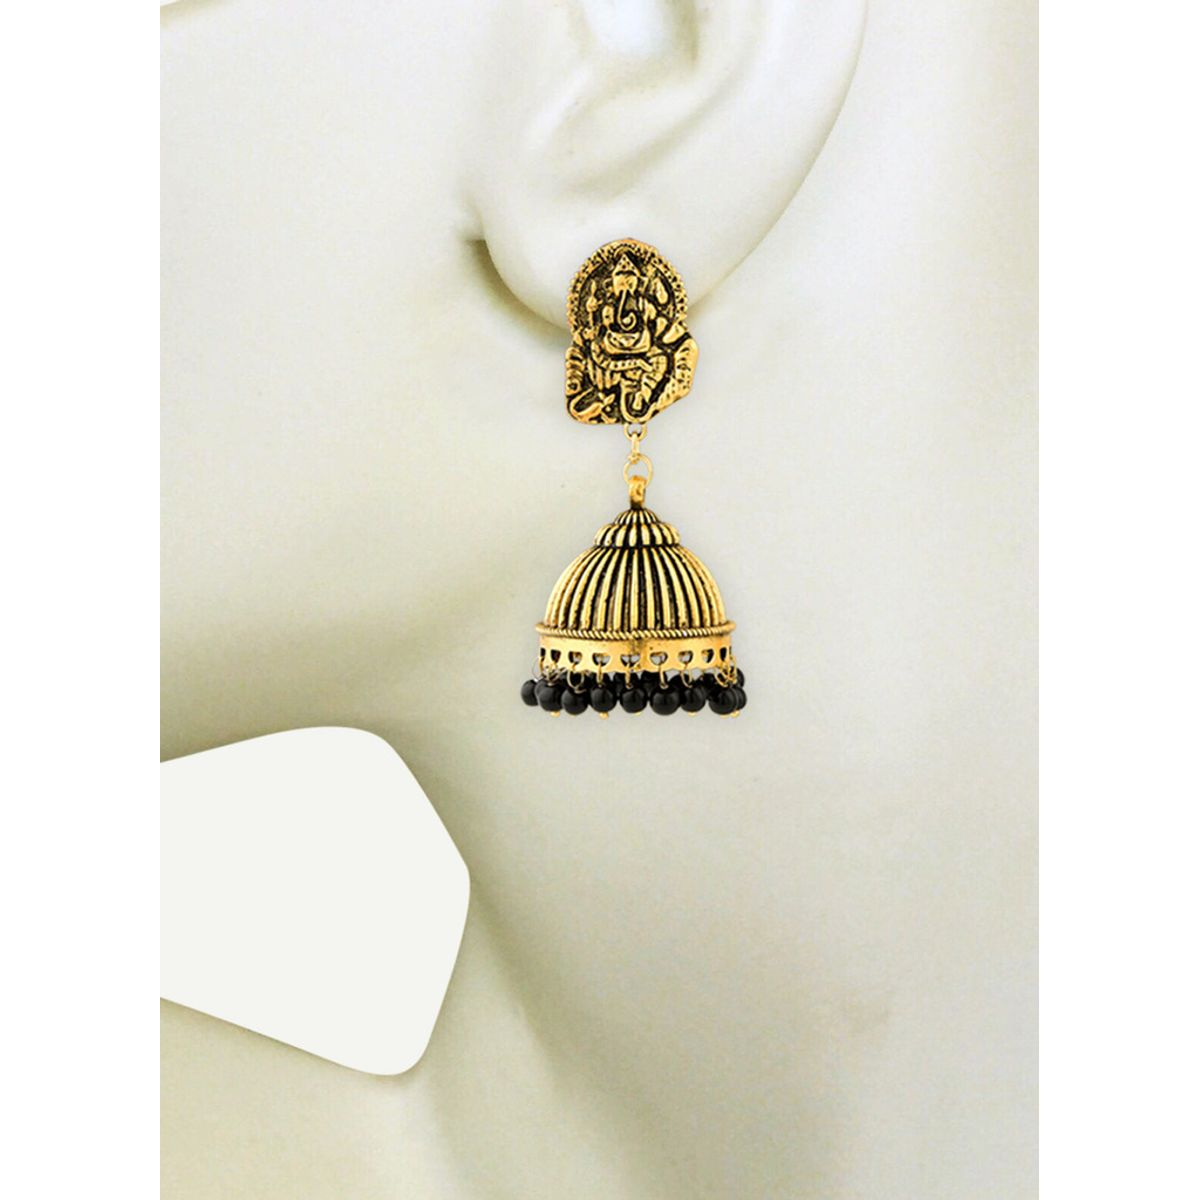 WATCH ME Banjara Boho pom Pom Trendy Fashionable Partywear Earrings Jhumki for Women Girls WMRPG-095